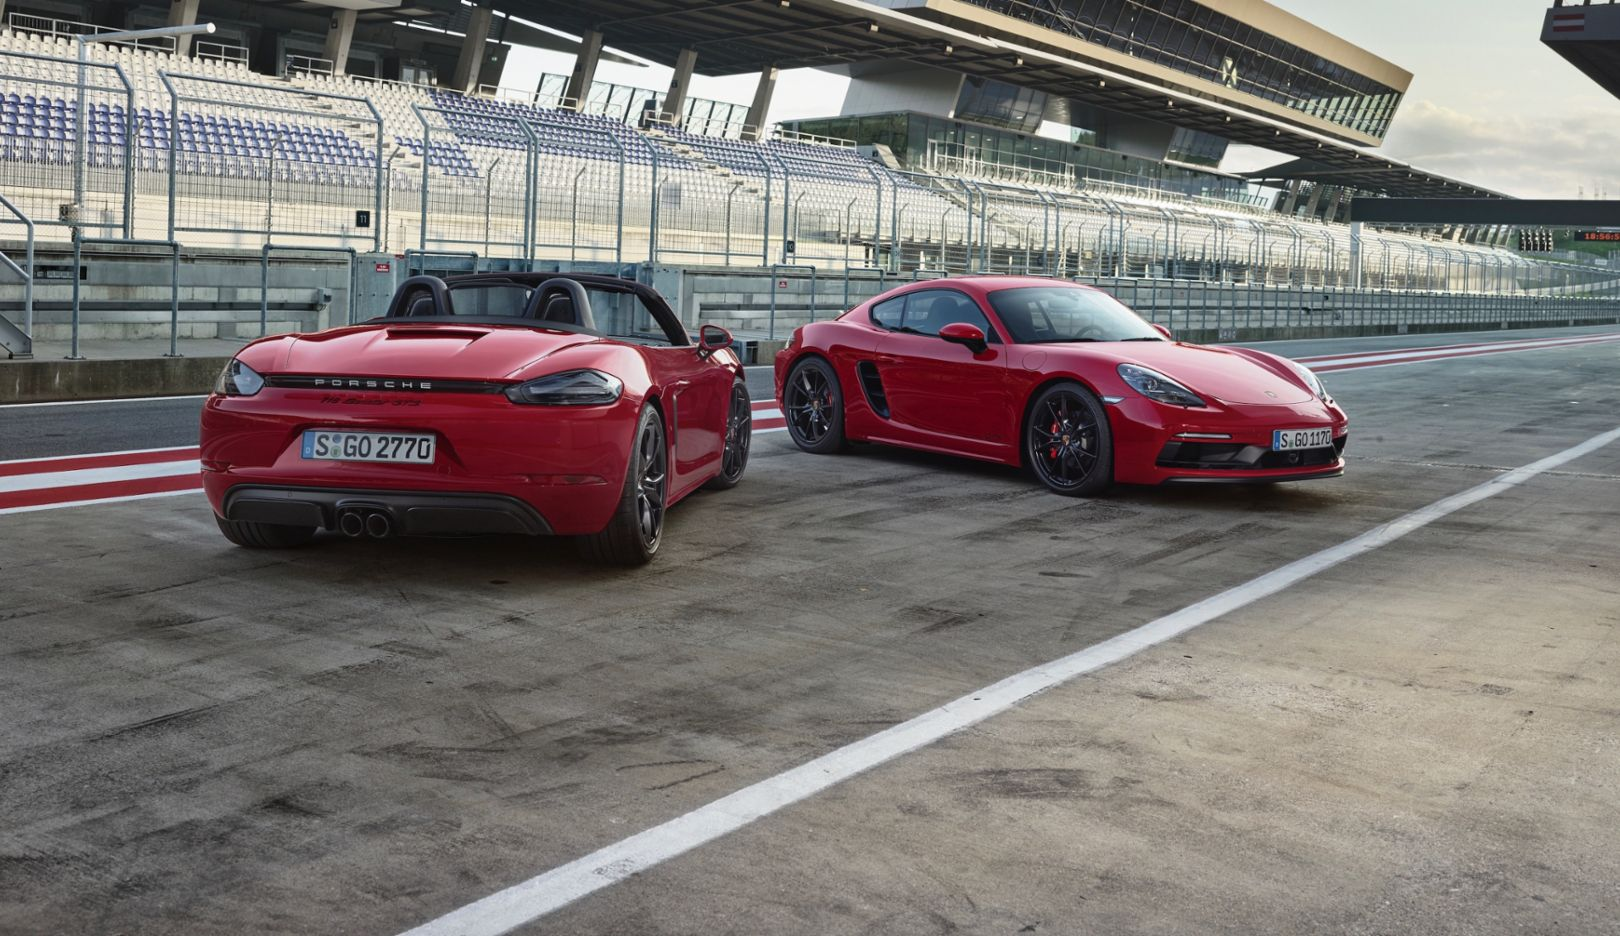 718 Boxster GTS, 718 Cayman GTS, l-r, 2017, Porsche AG